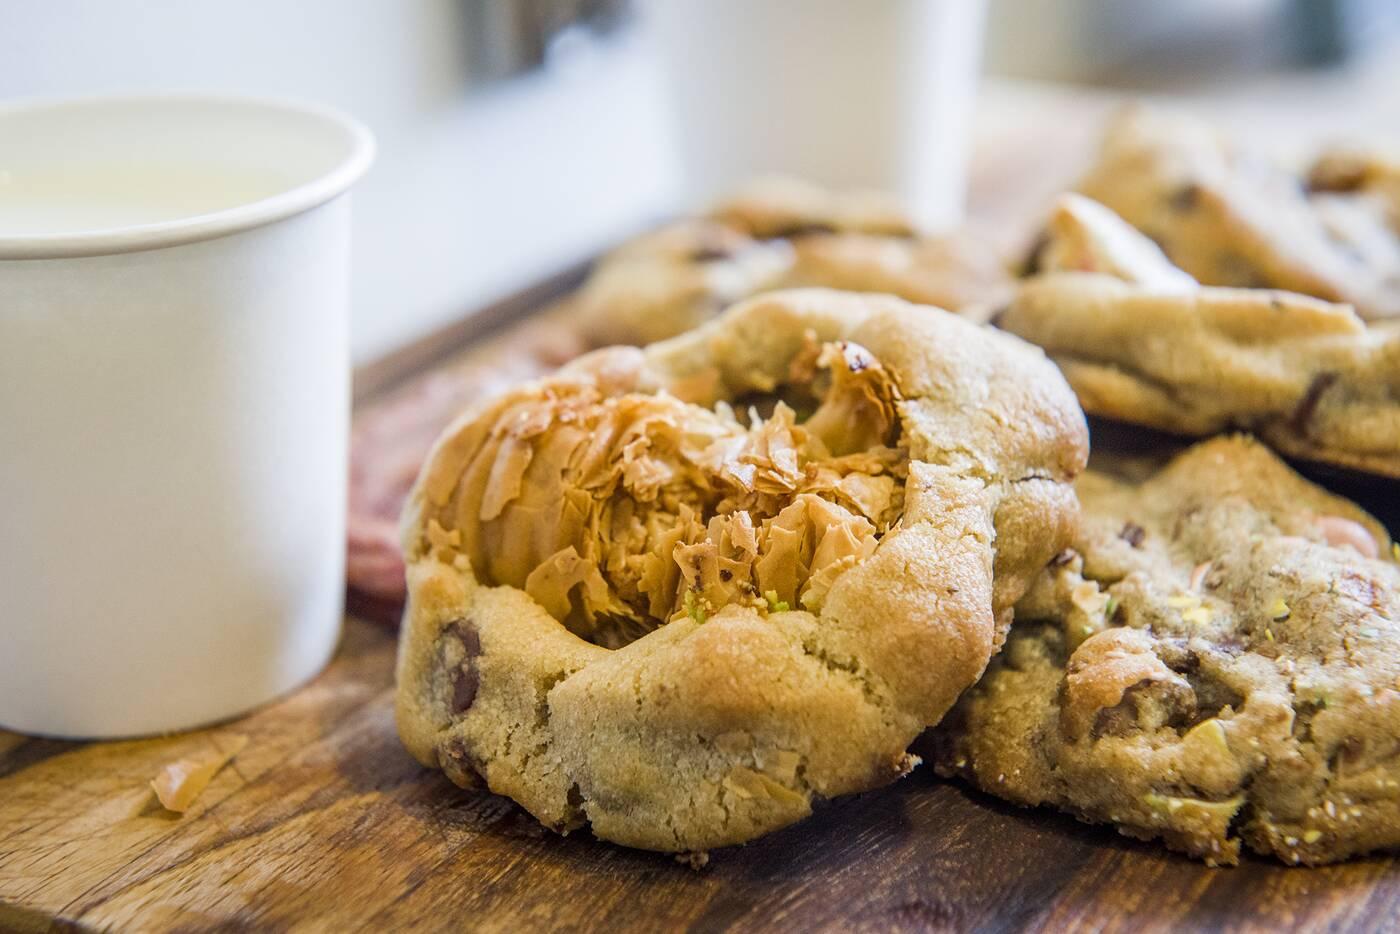 craigs cookies toronto